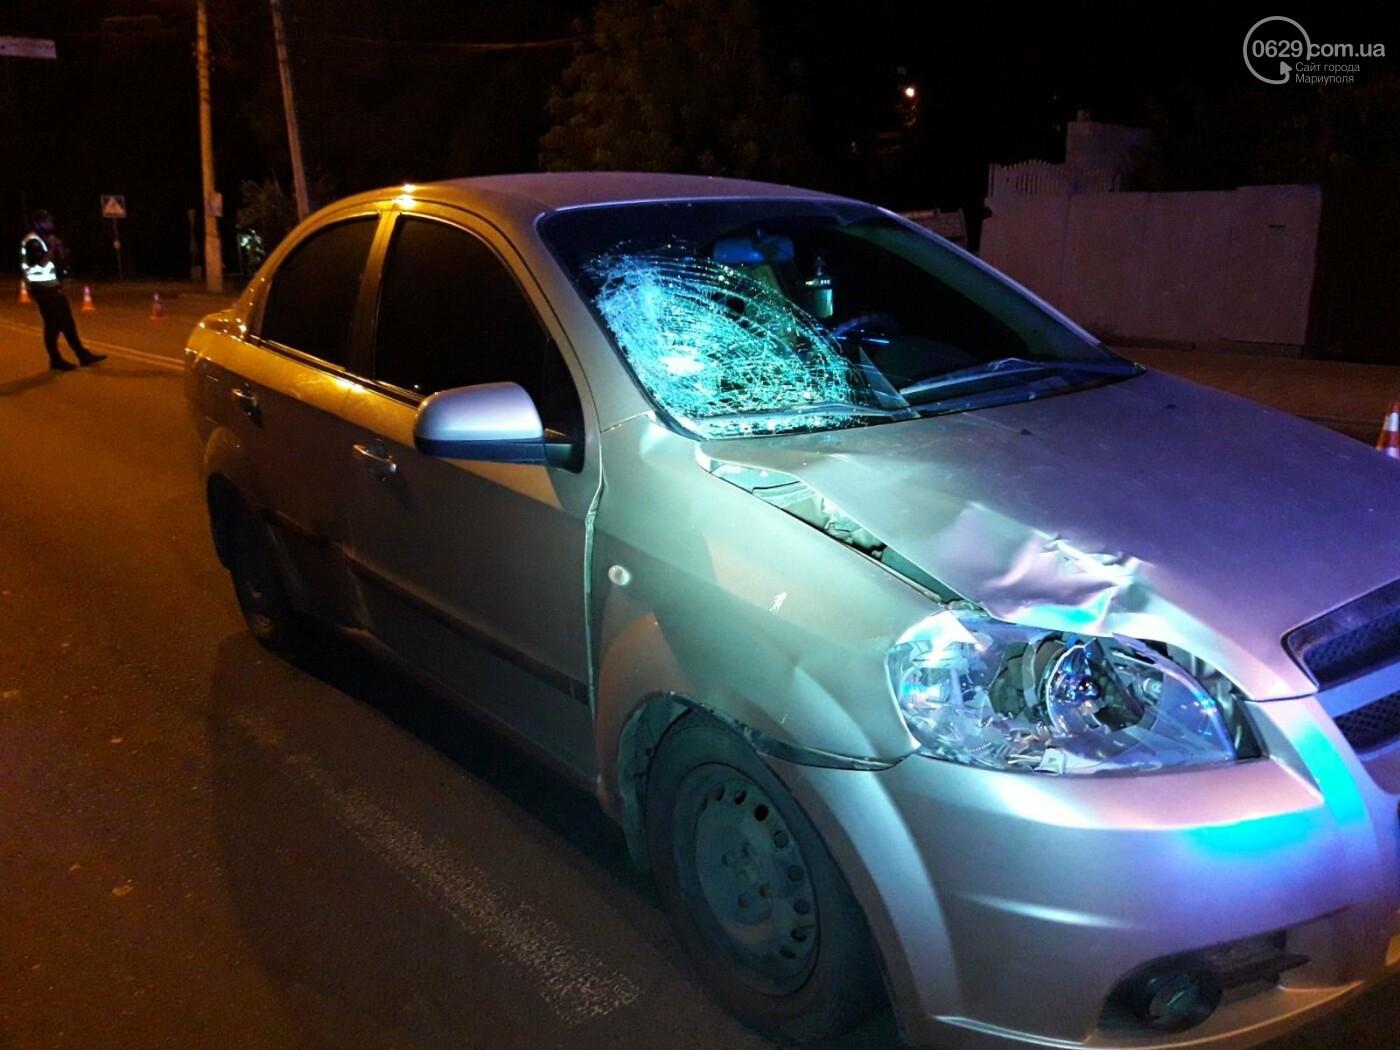 В центре Мариуполя на «зебре» Chevrolet сбил девушку, - ФОТО, ВИДЕО, фото-3